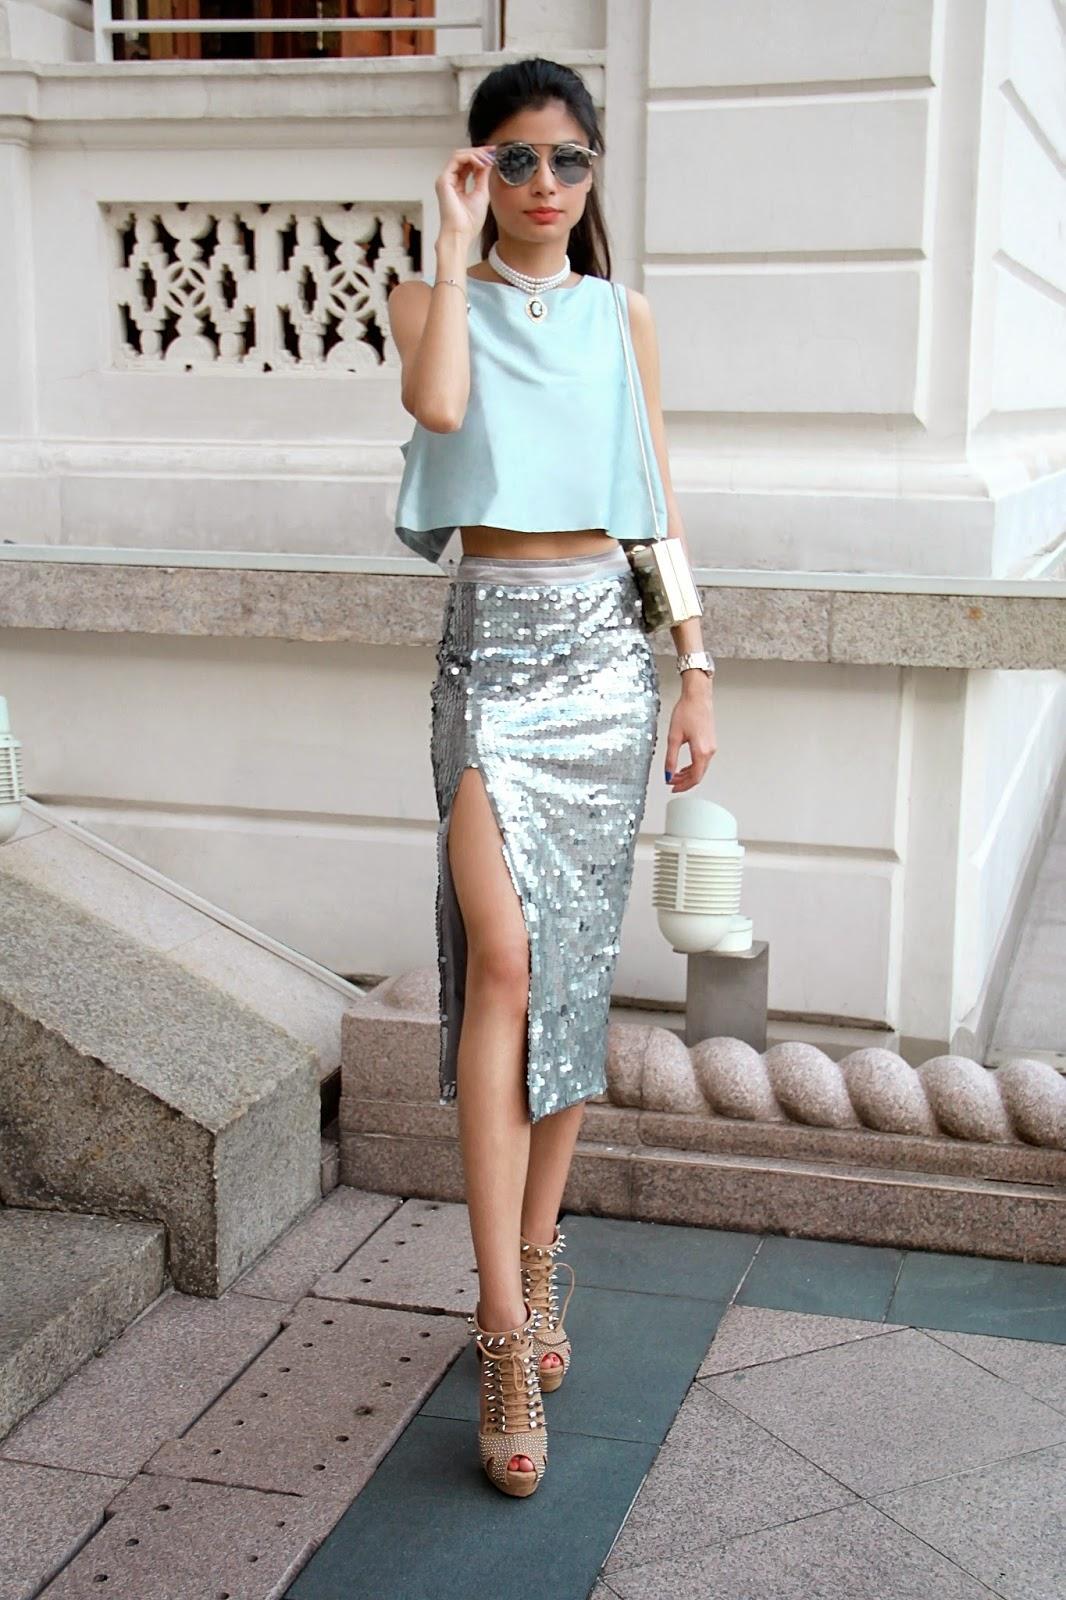 Ultra feminine fashion